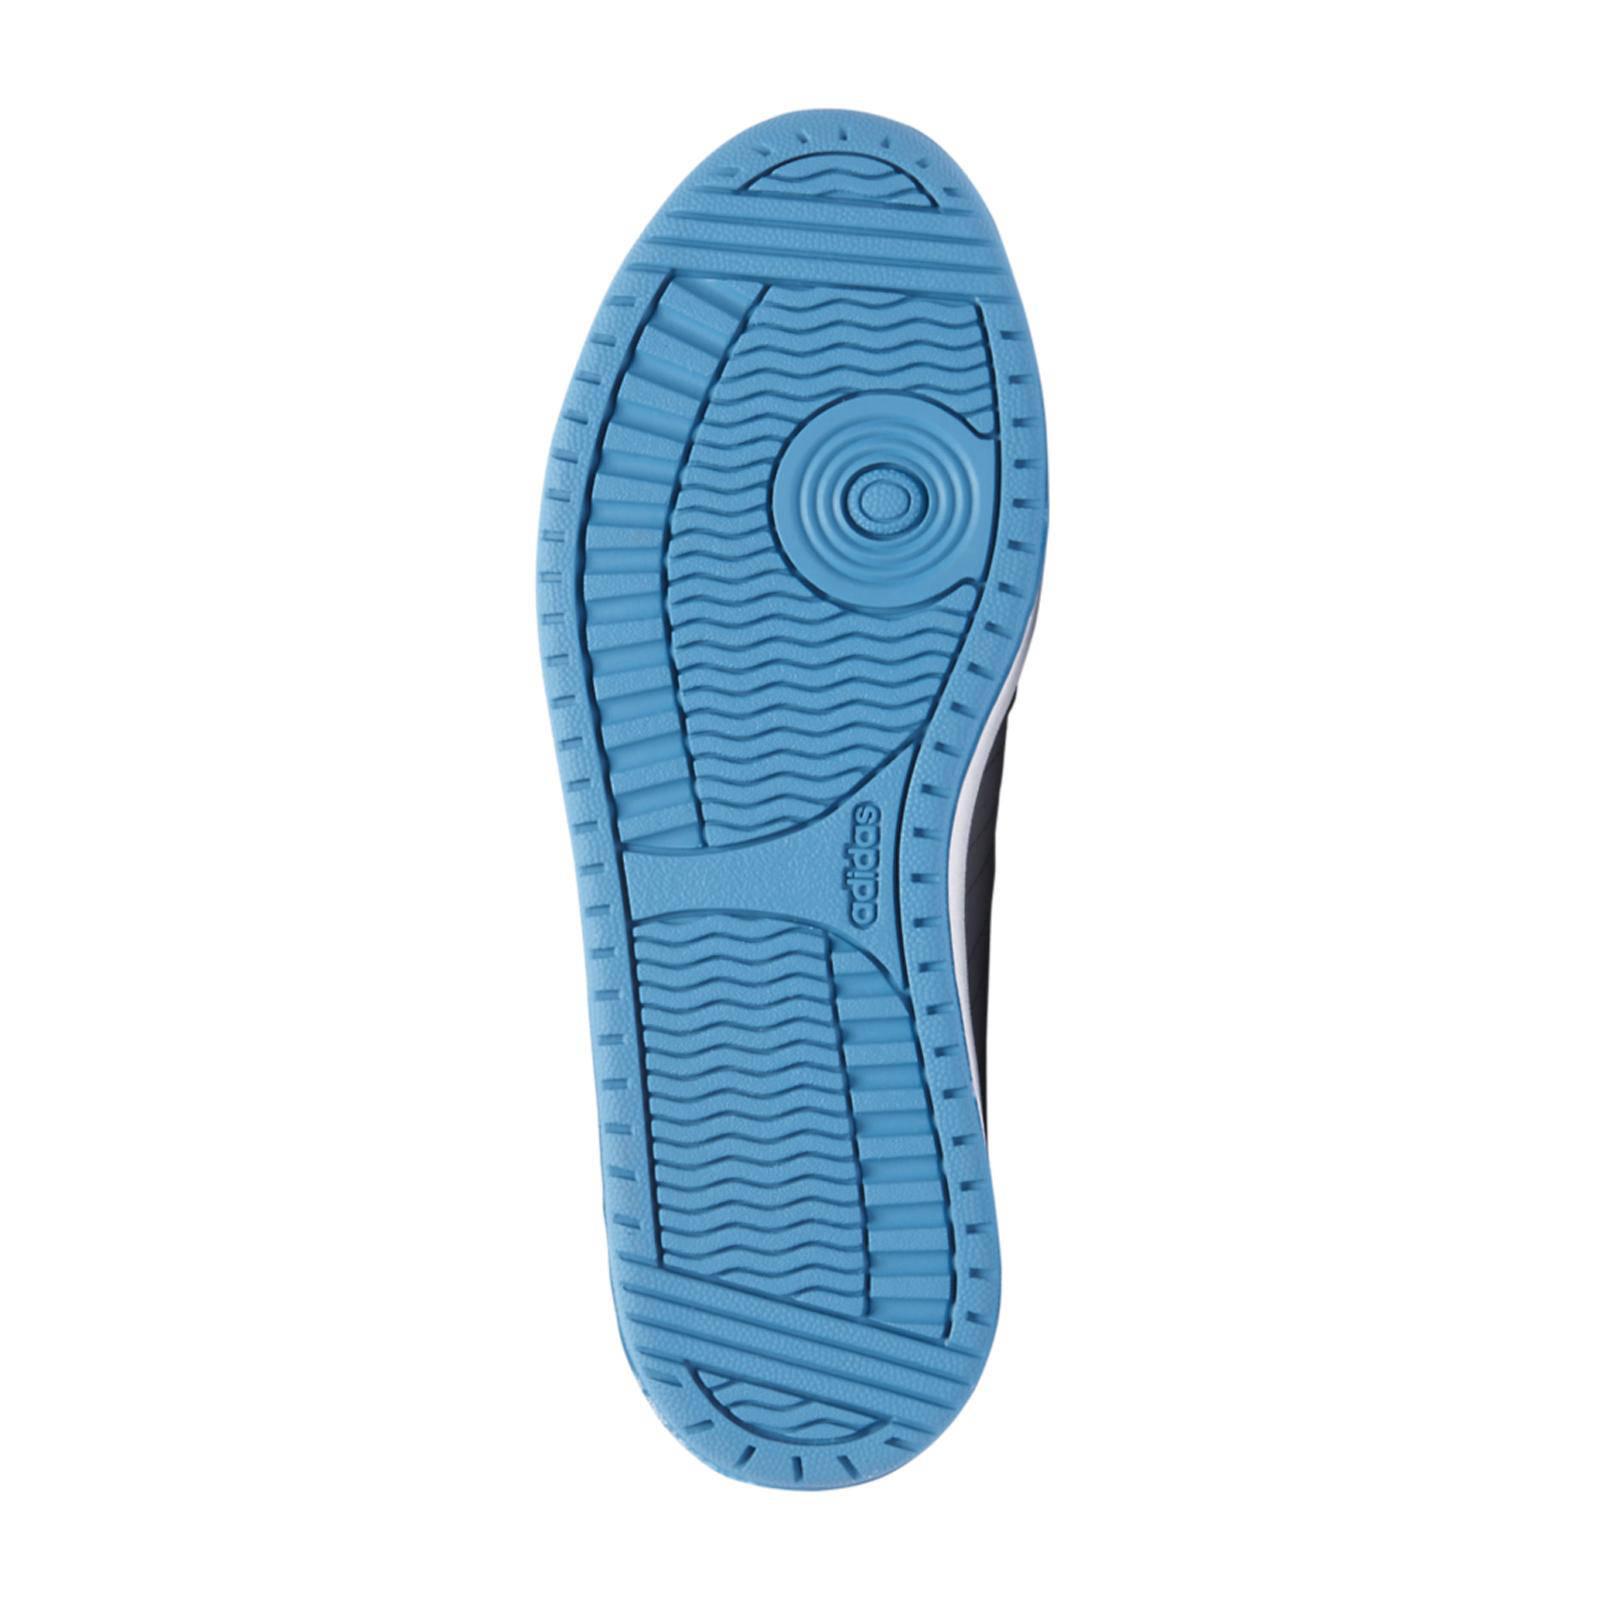   Adidas Vs Hoops K Sneaker laag Jongens